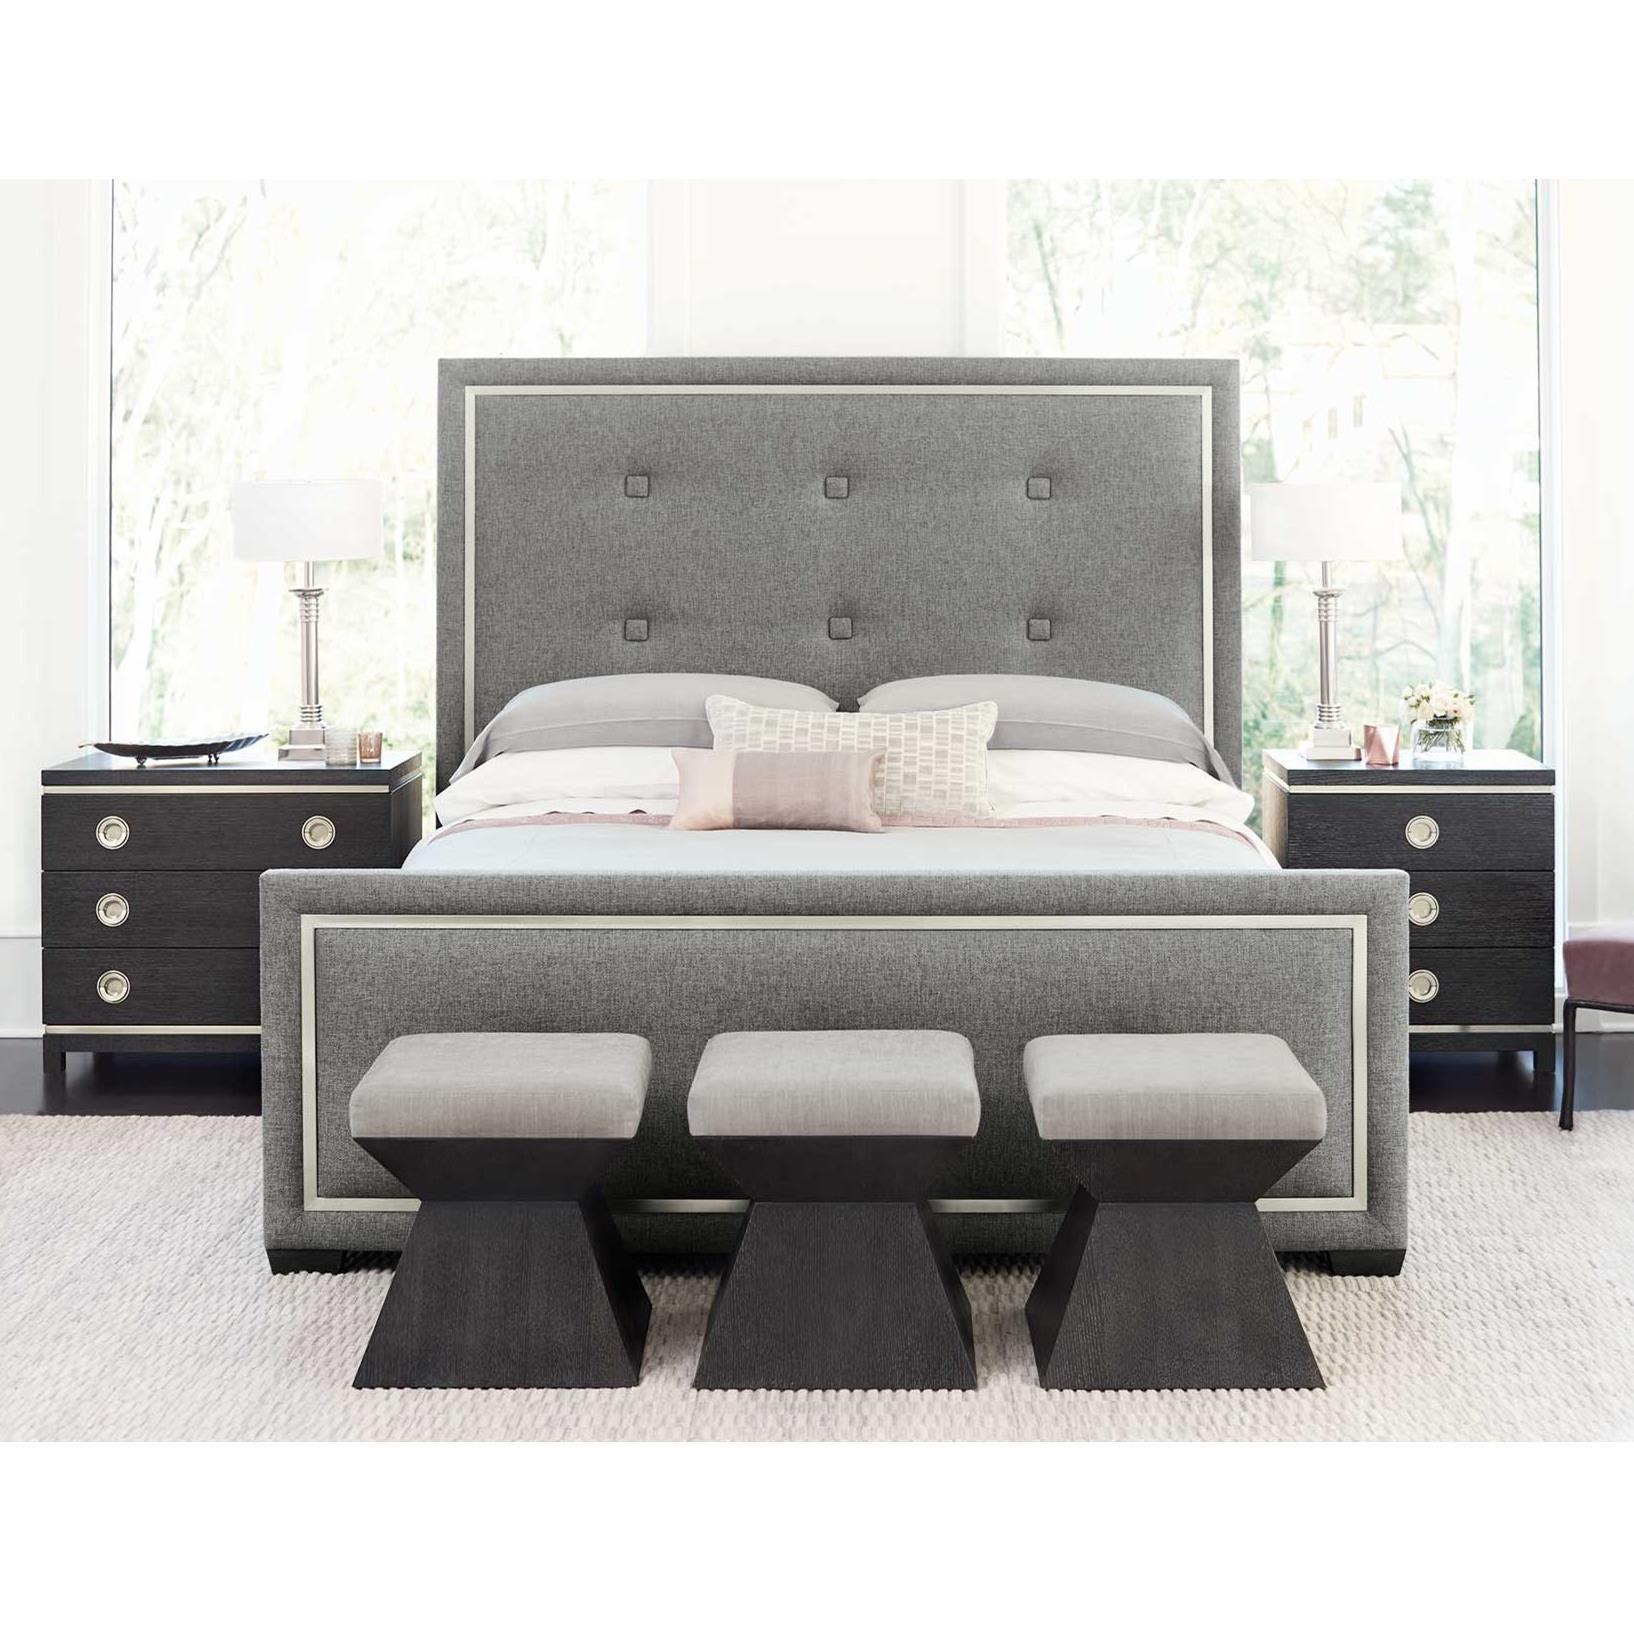 Decorage Queen Bedroom Group by Bernhardt at Baer's Furniture